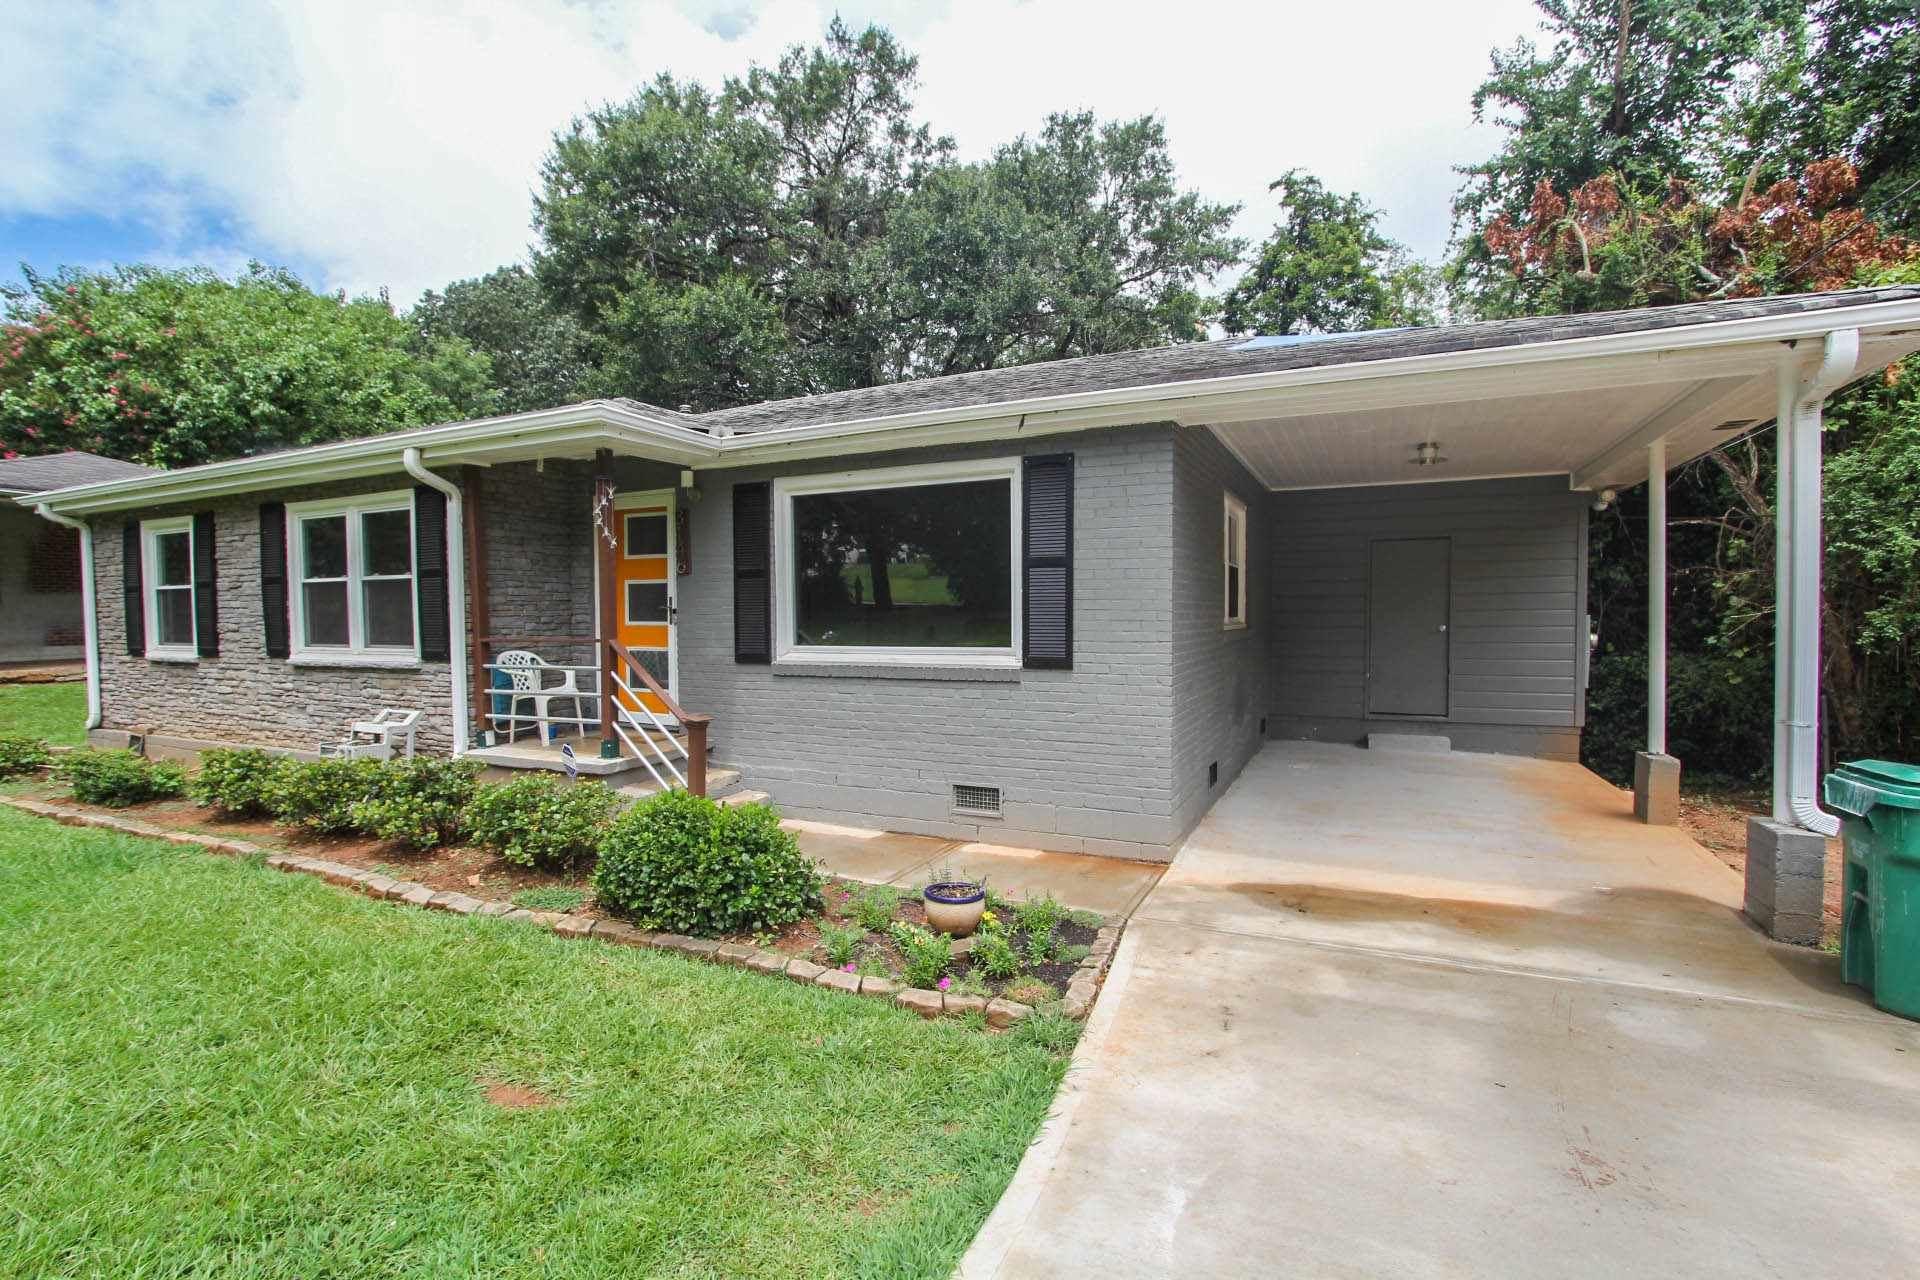 3146 Bluebird Ln, Decatur, GA 30032 - MLS#: 8832247